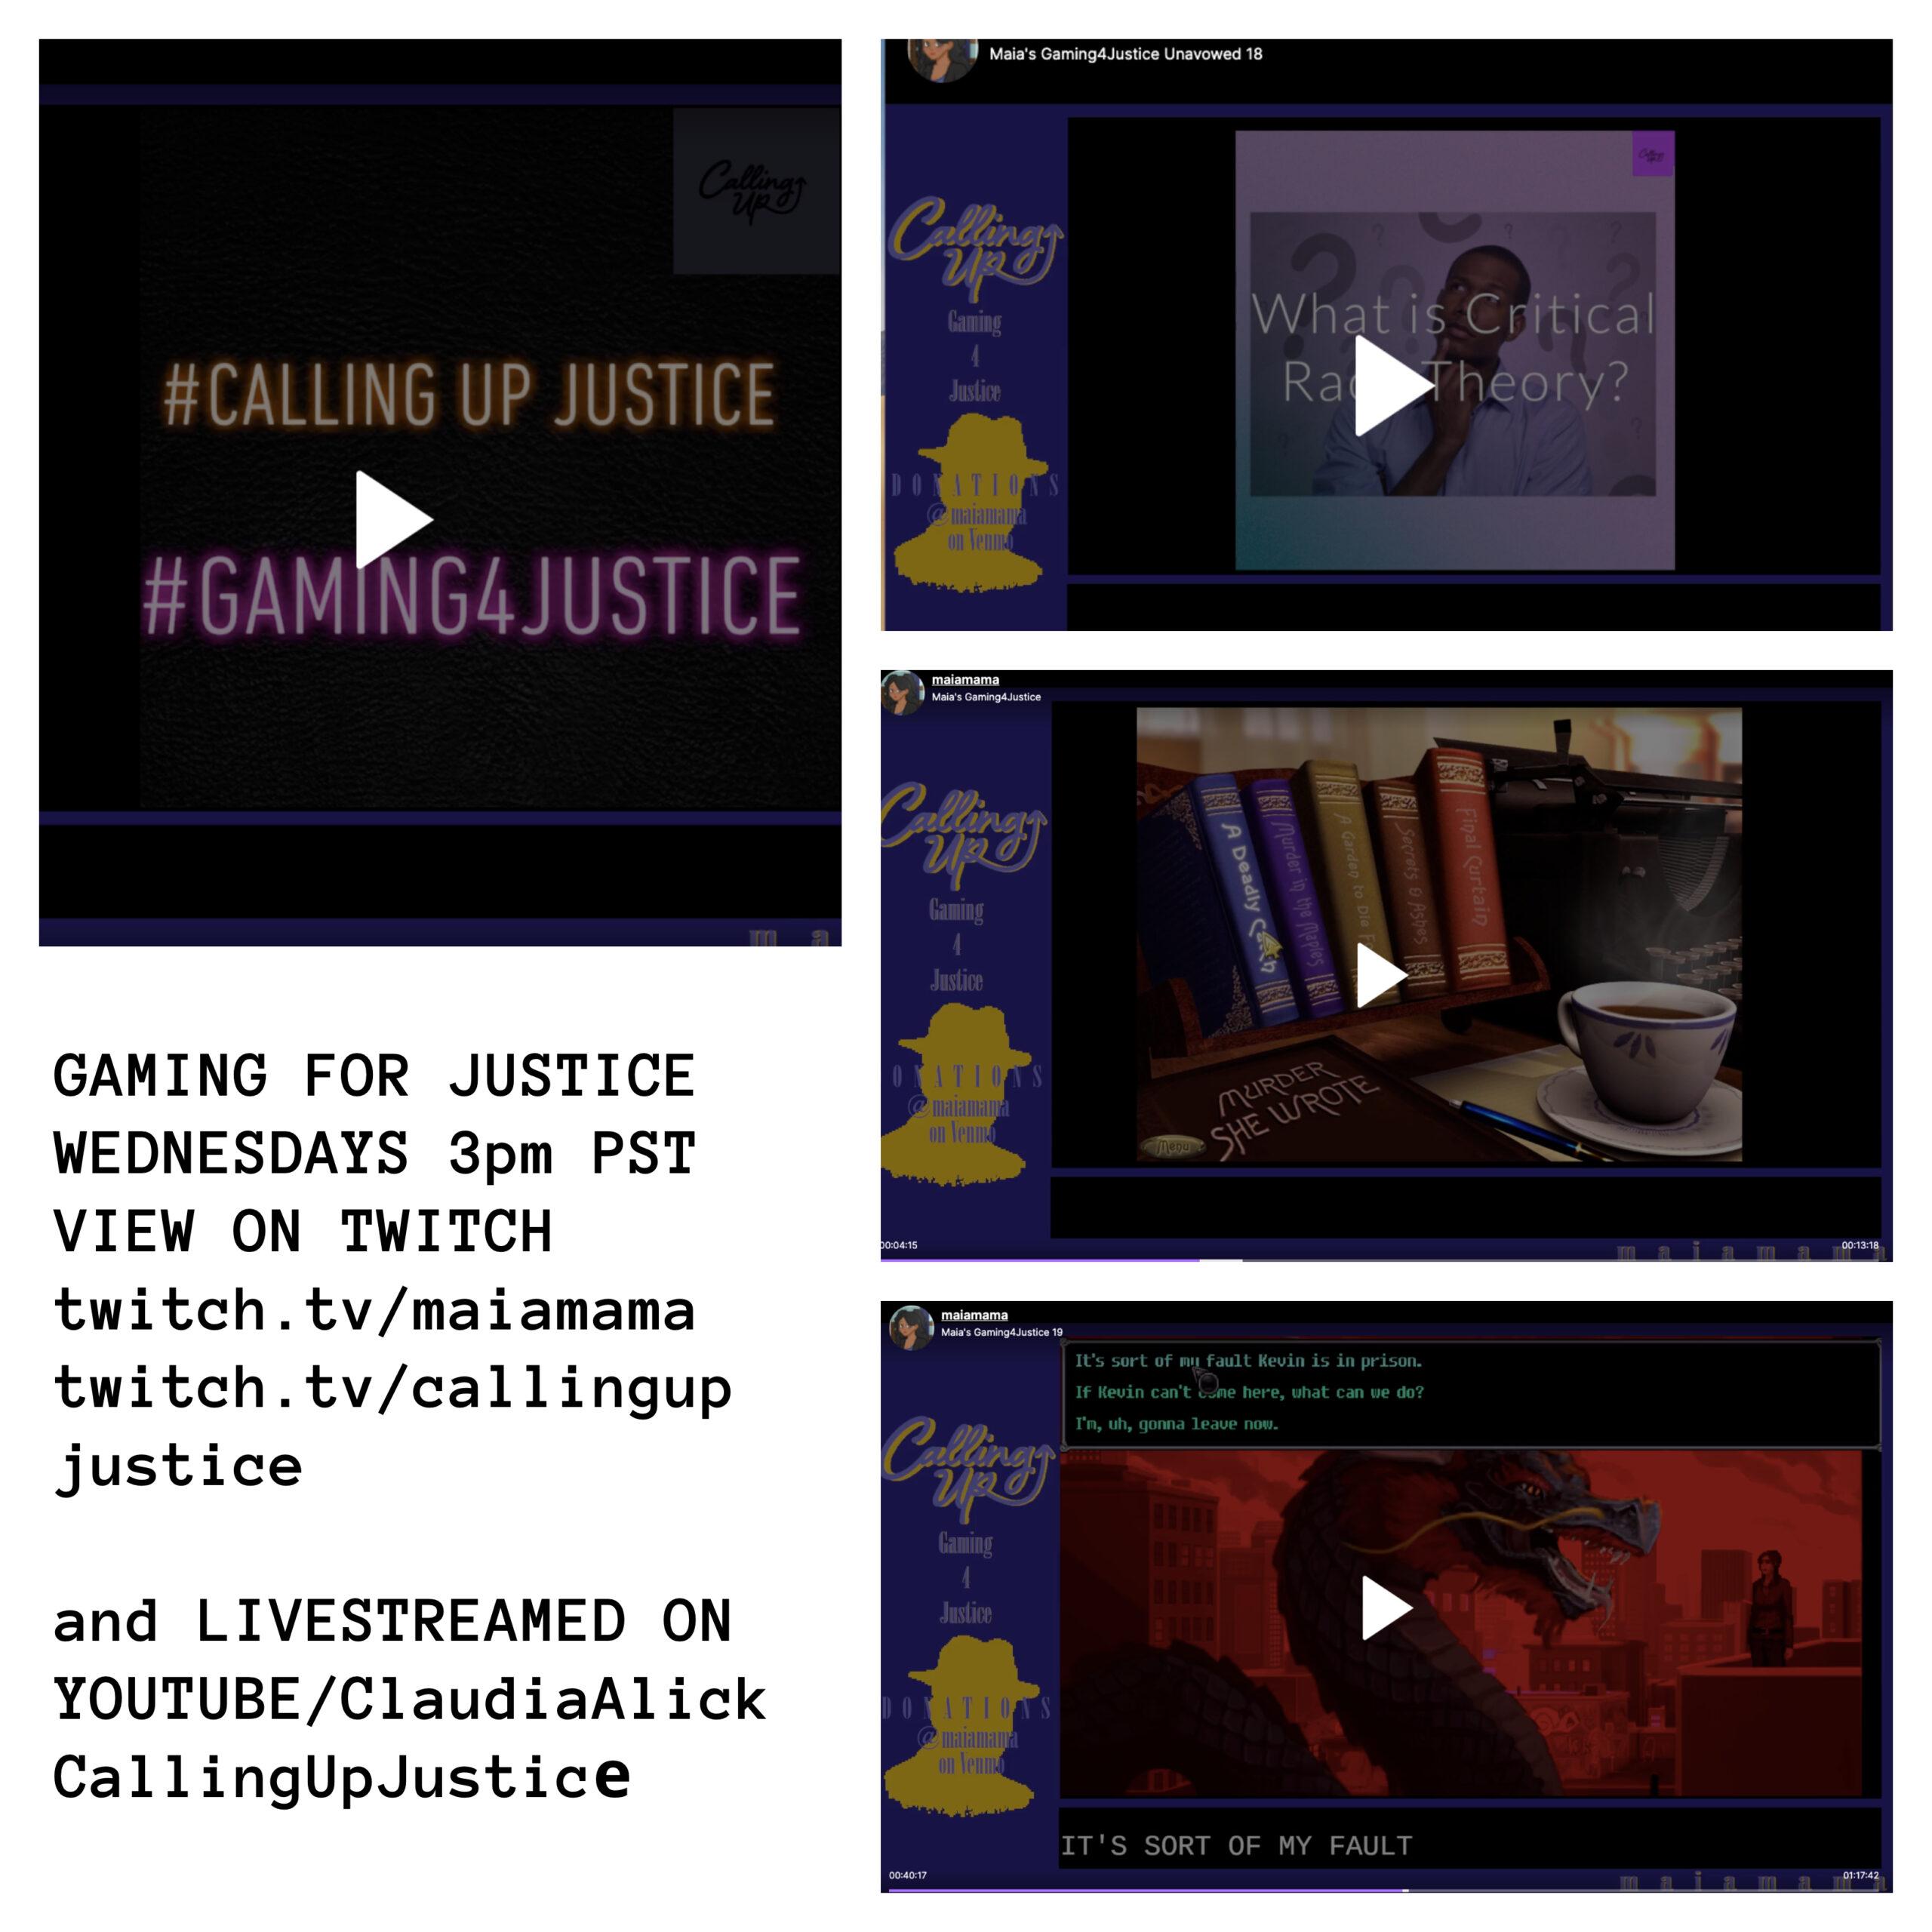 gaming 4 justice